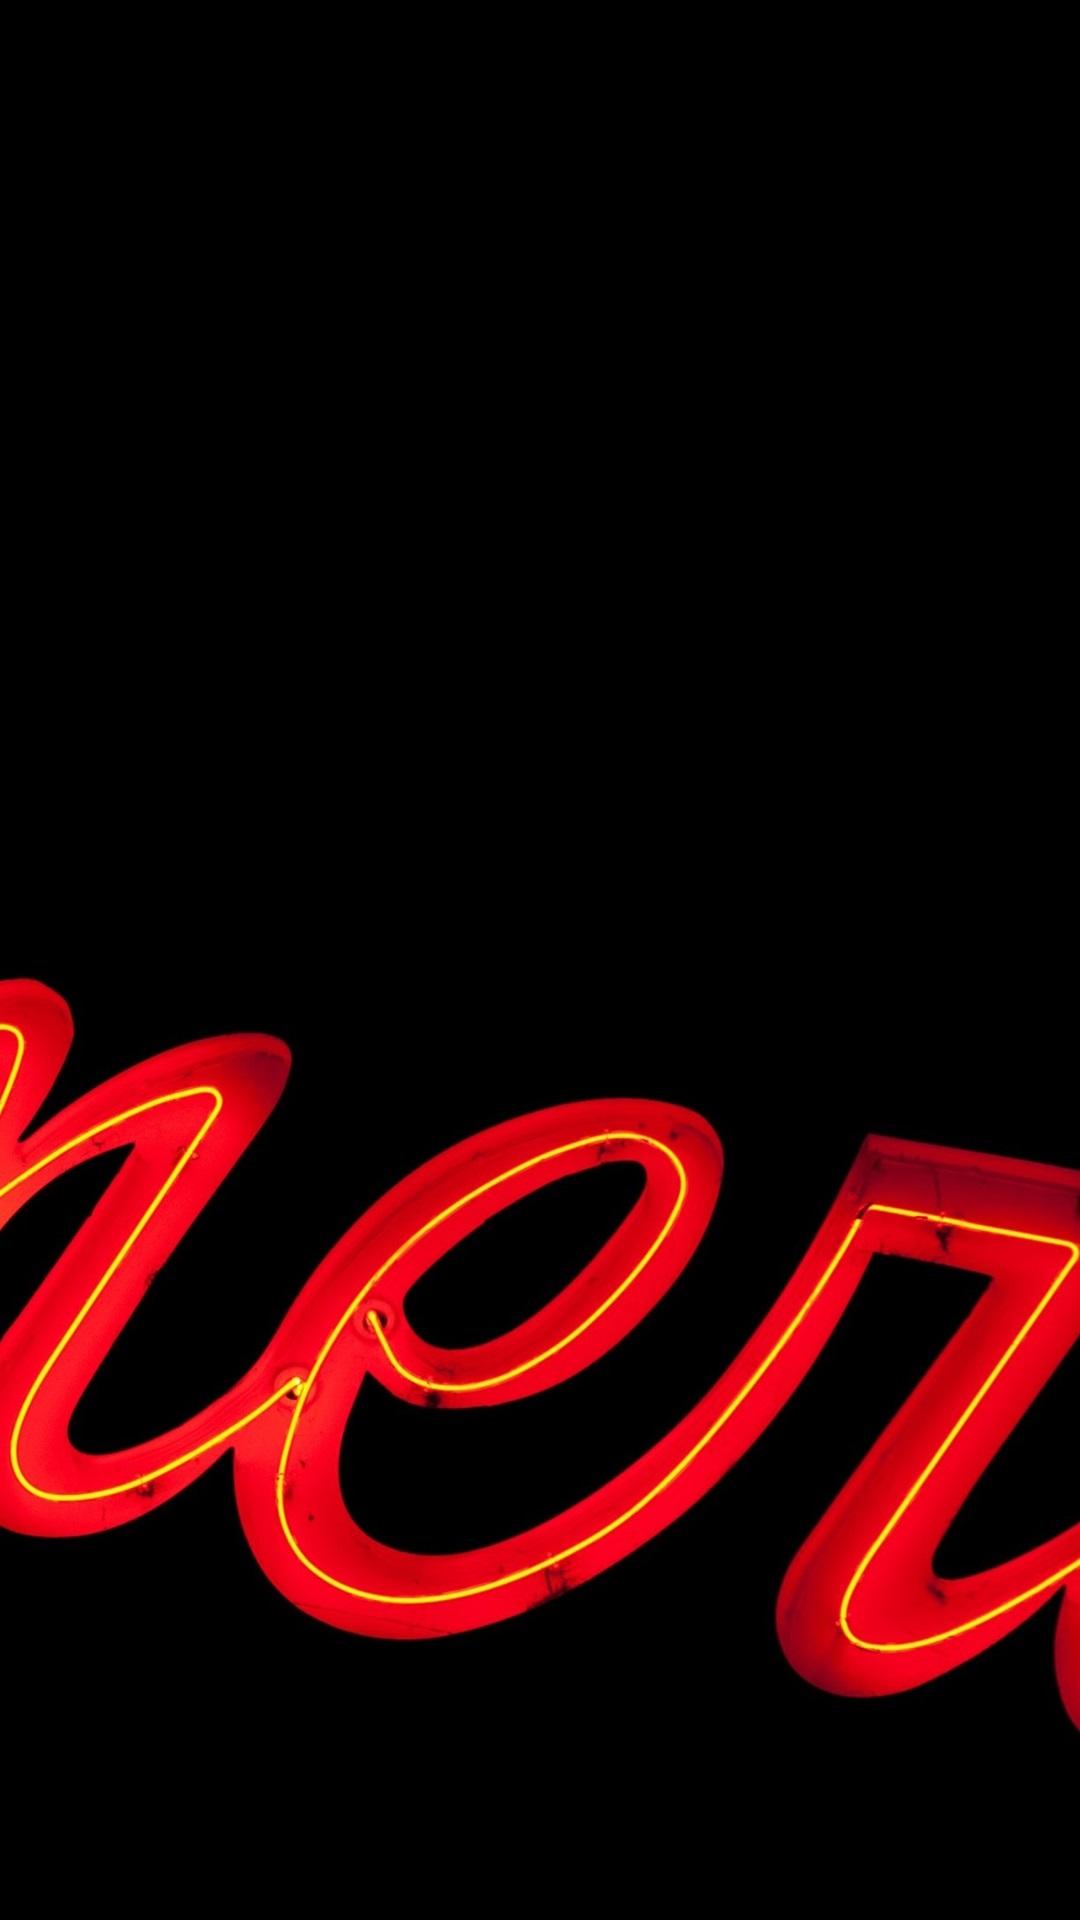 Unduh 300+ Wallpaper Iphone Neon Lights HD